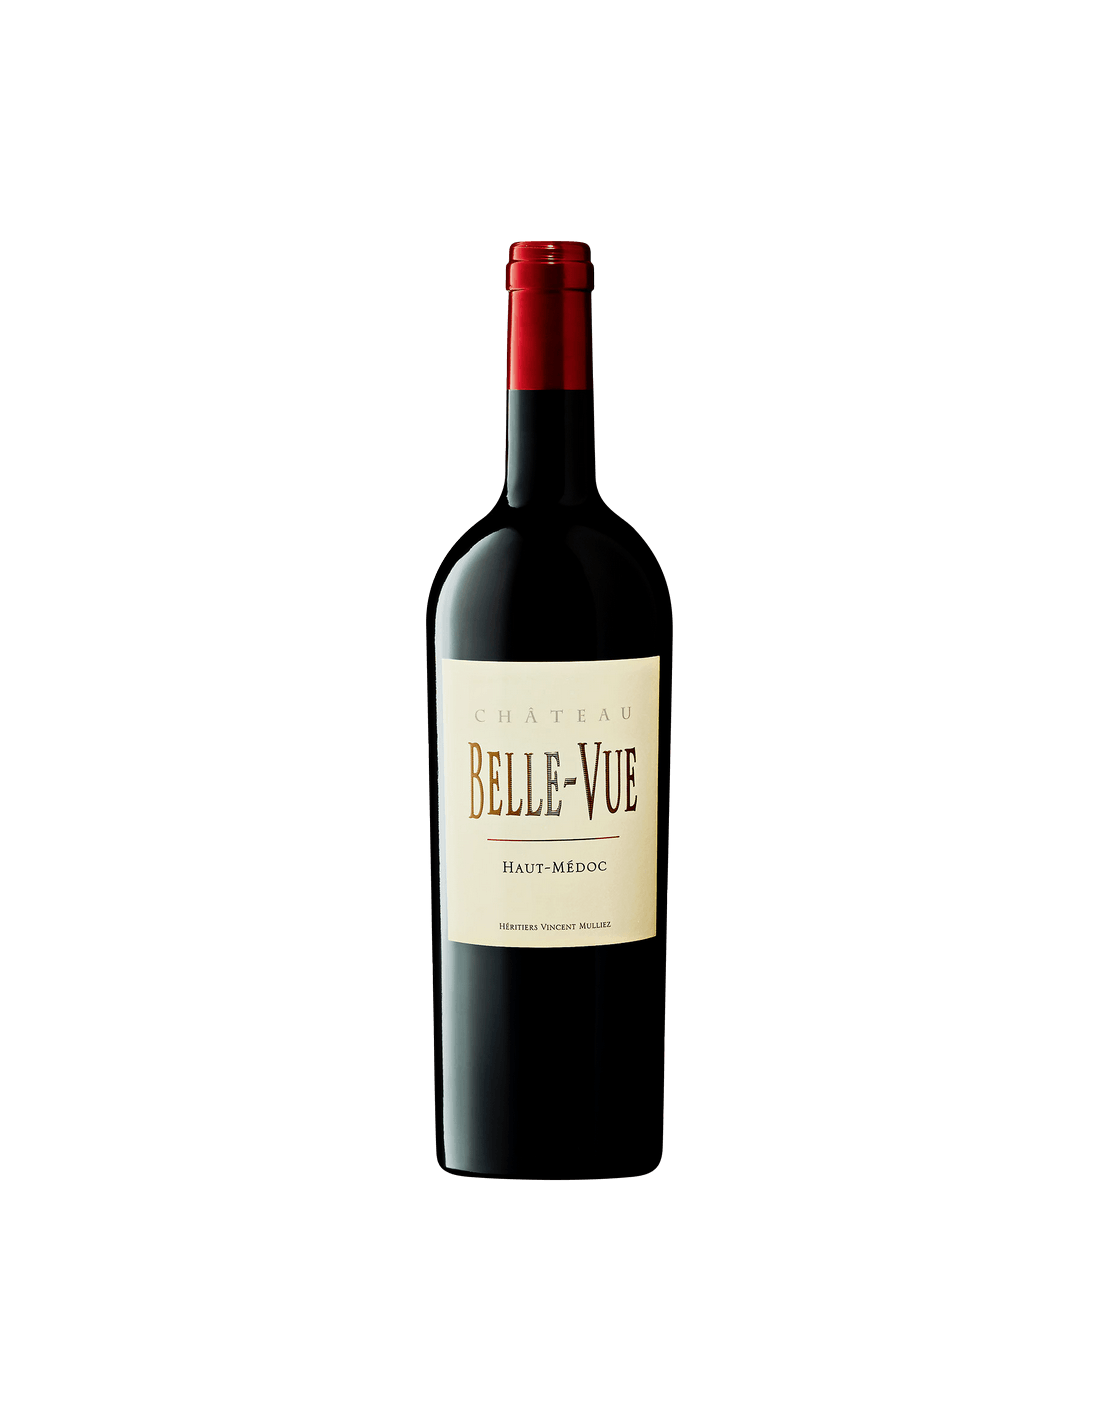 Vin rosu, Chateau Belle-Vue Haut-Medoc, 0.75L, 13.5% alc., Franta